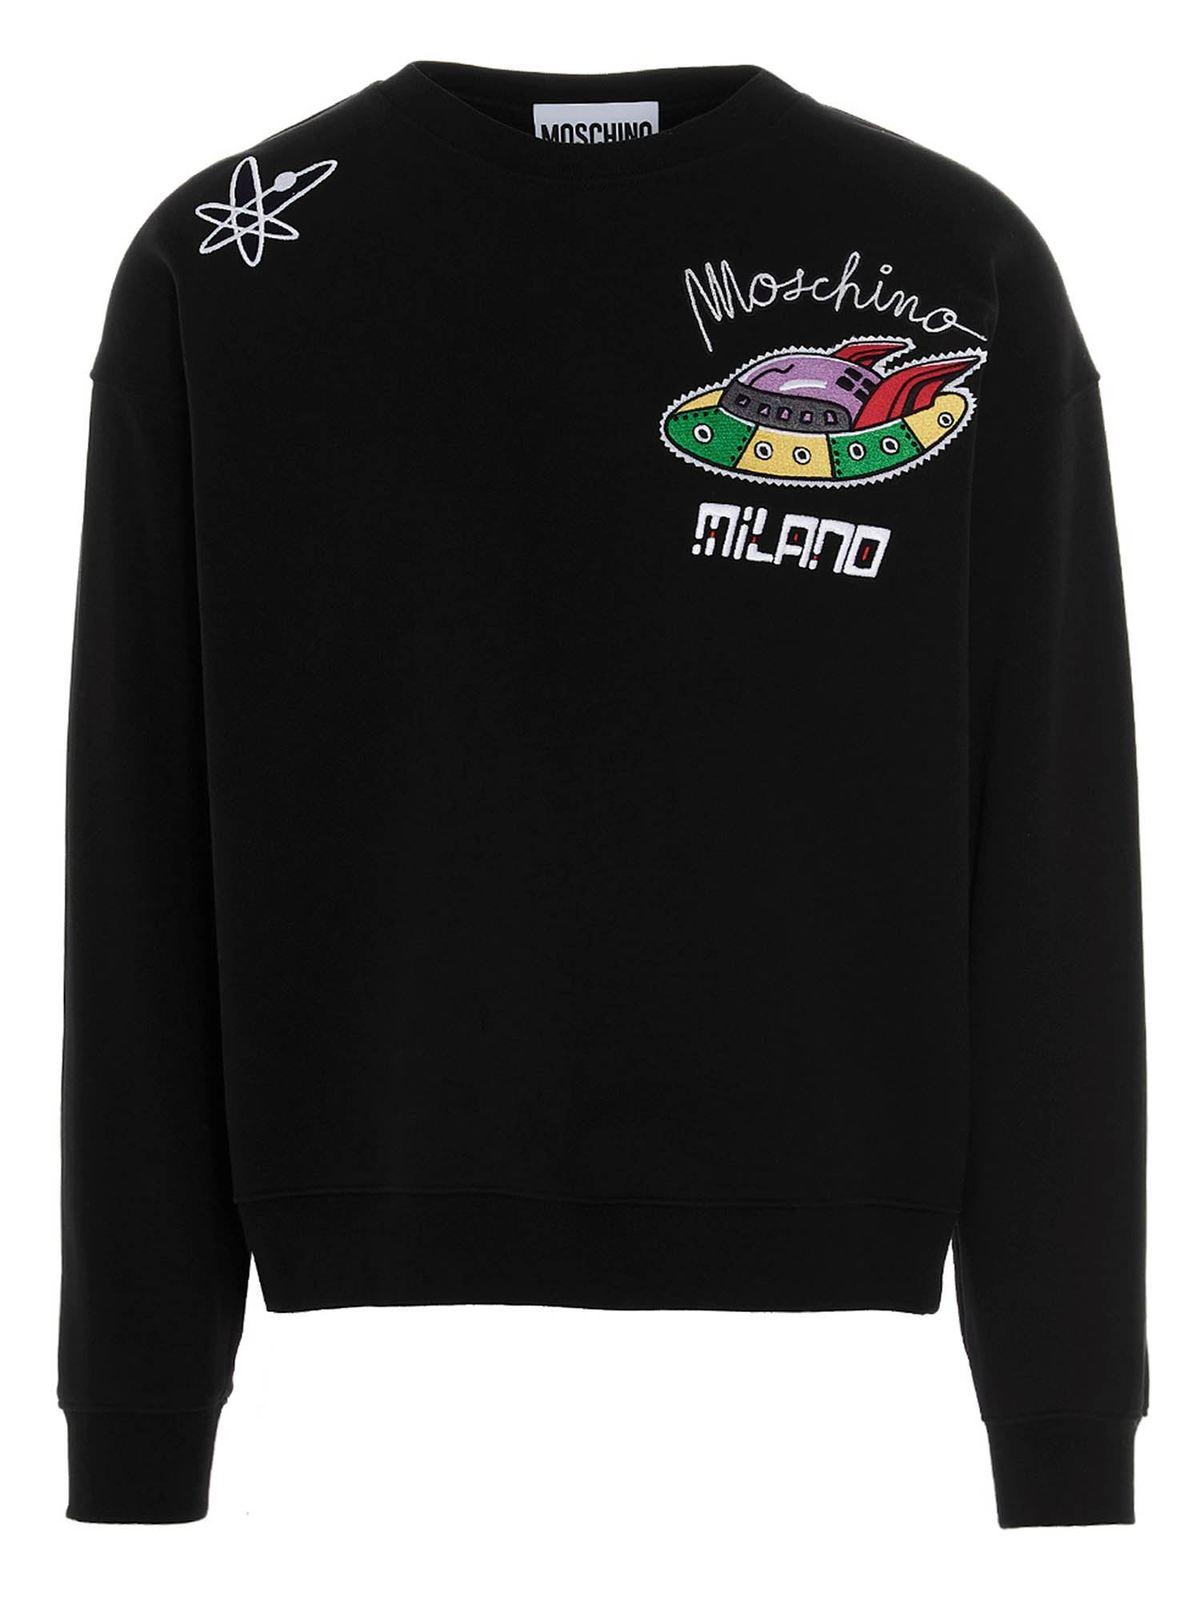 Moschino Cottons GALAXY SWEATSHIRT IN BLACK